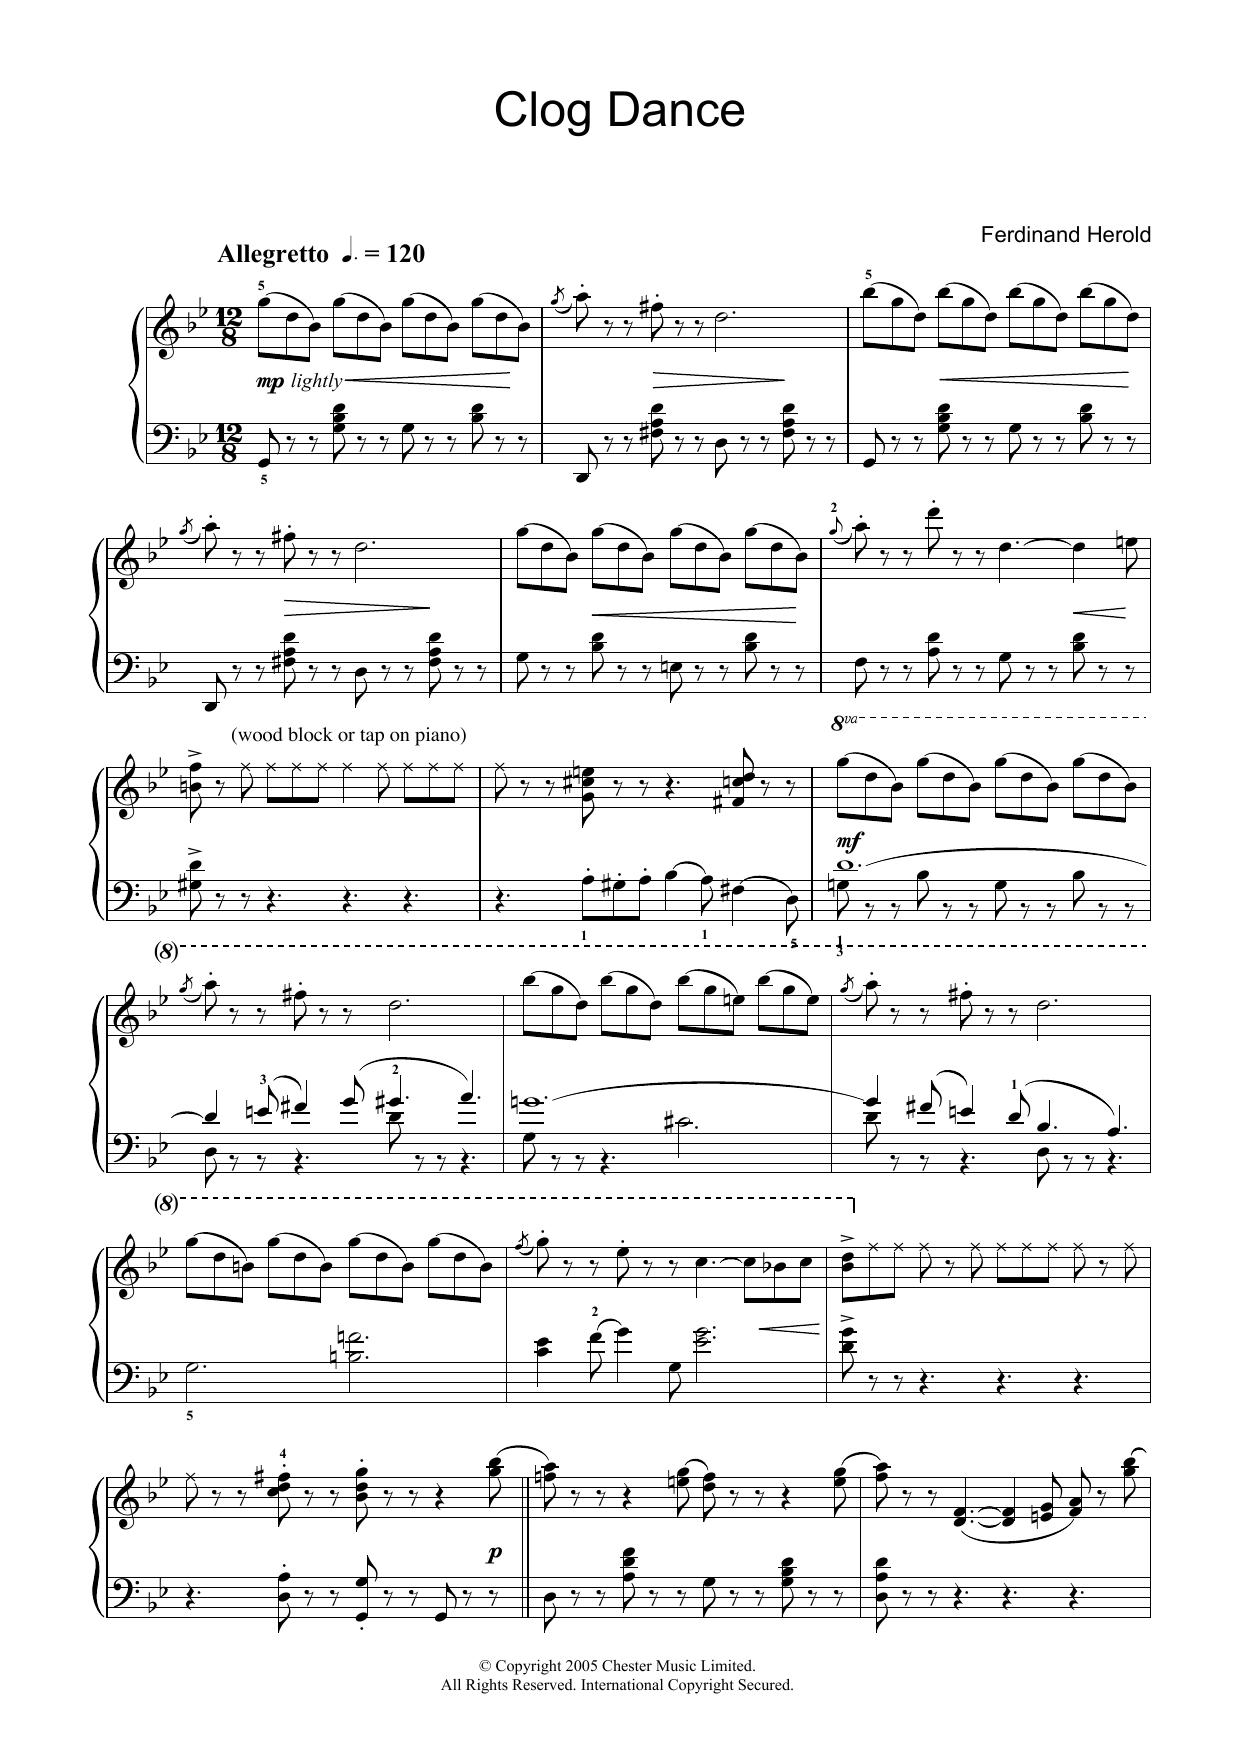 Clog Dance from La Fille Mal Gardée Sheet Music